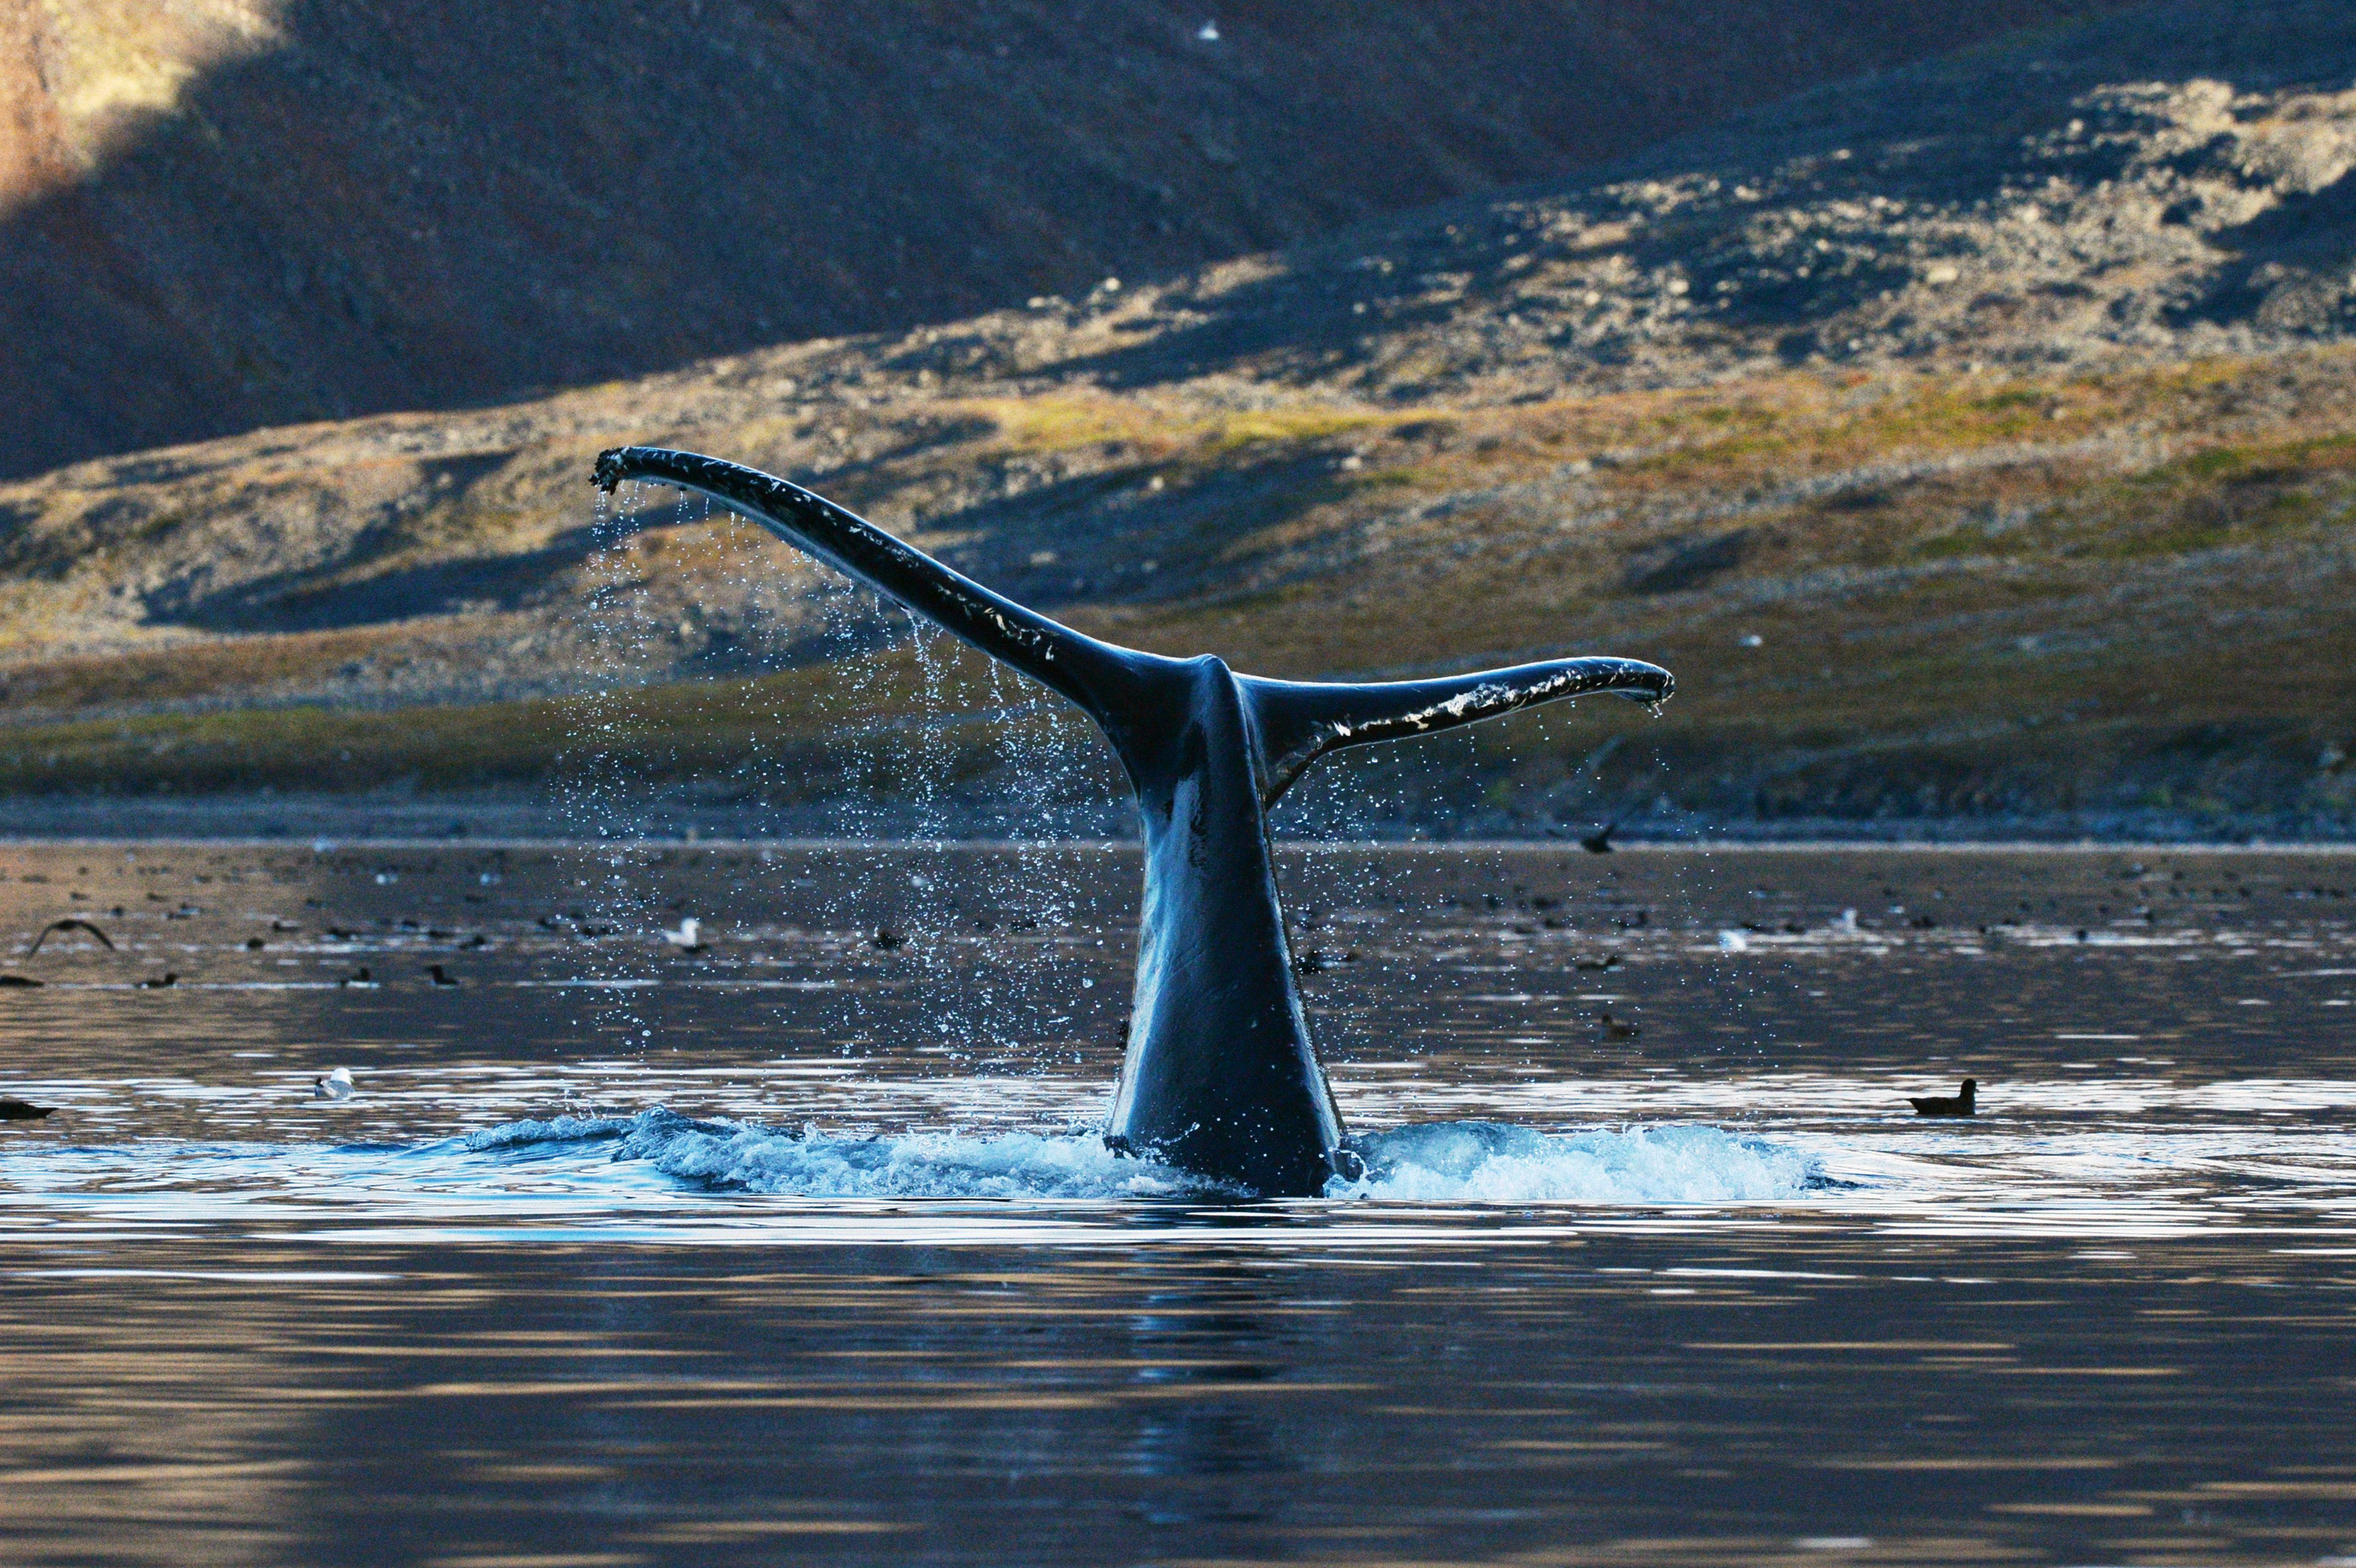 Gray whale in the Senyavin Strait near Yttygran Island in the Chukotka Autonomous Area